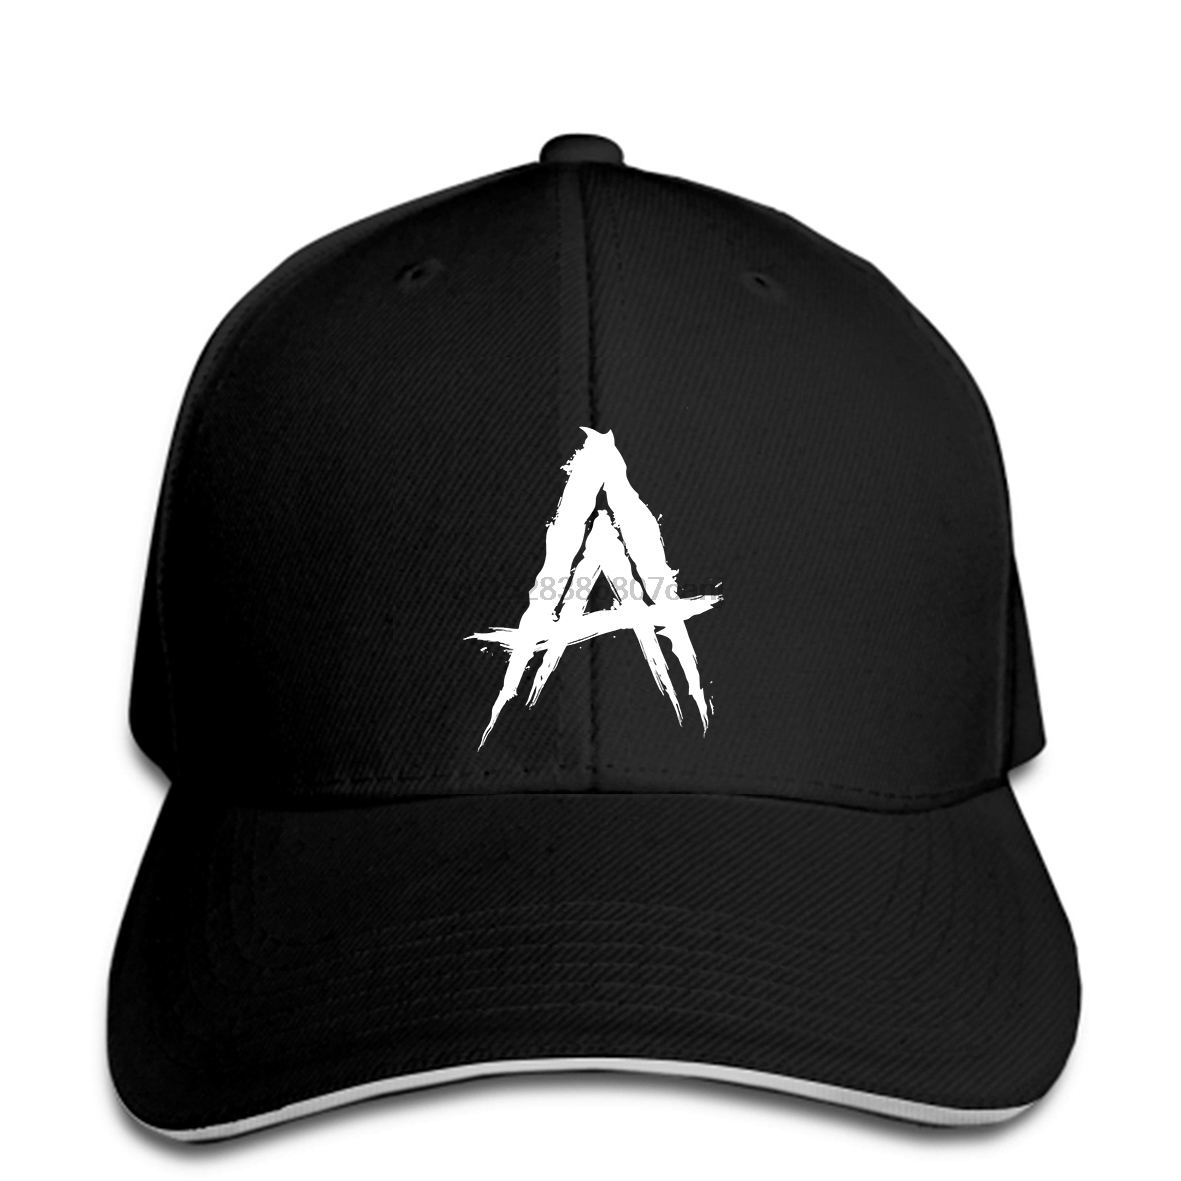 Papa Roach Who Do You Trust Tour 2019 Asking Alexandria Bad T Shirt Size S-5XL